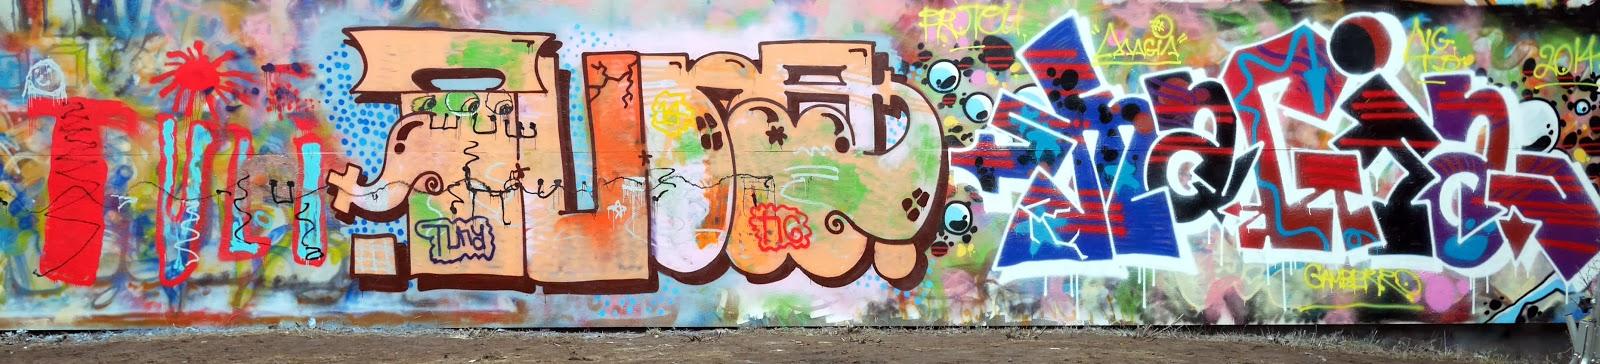 SprayDaily_Graffiti_Tuli_Tuna_Magia